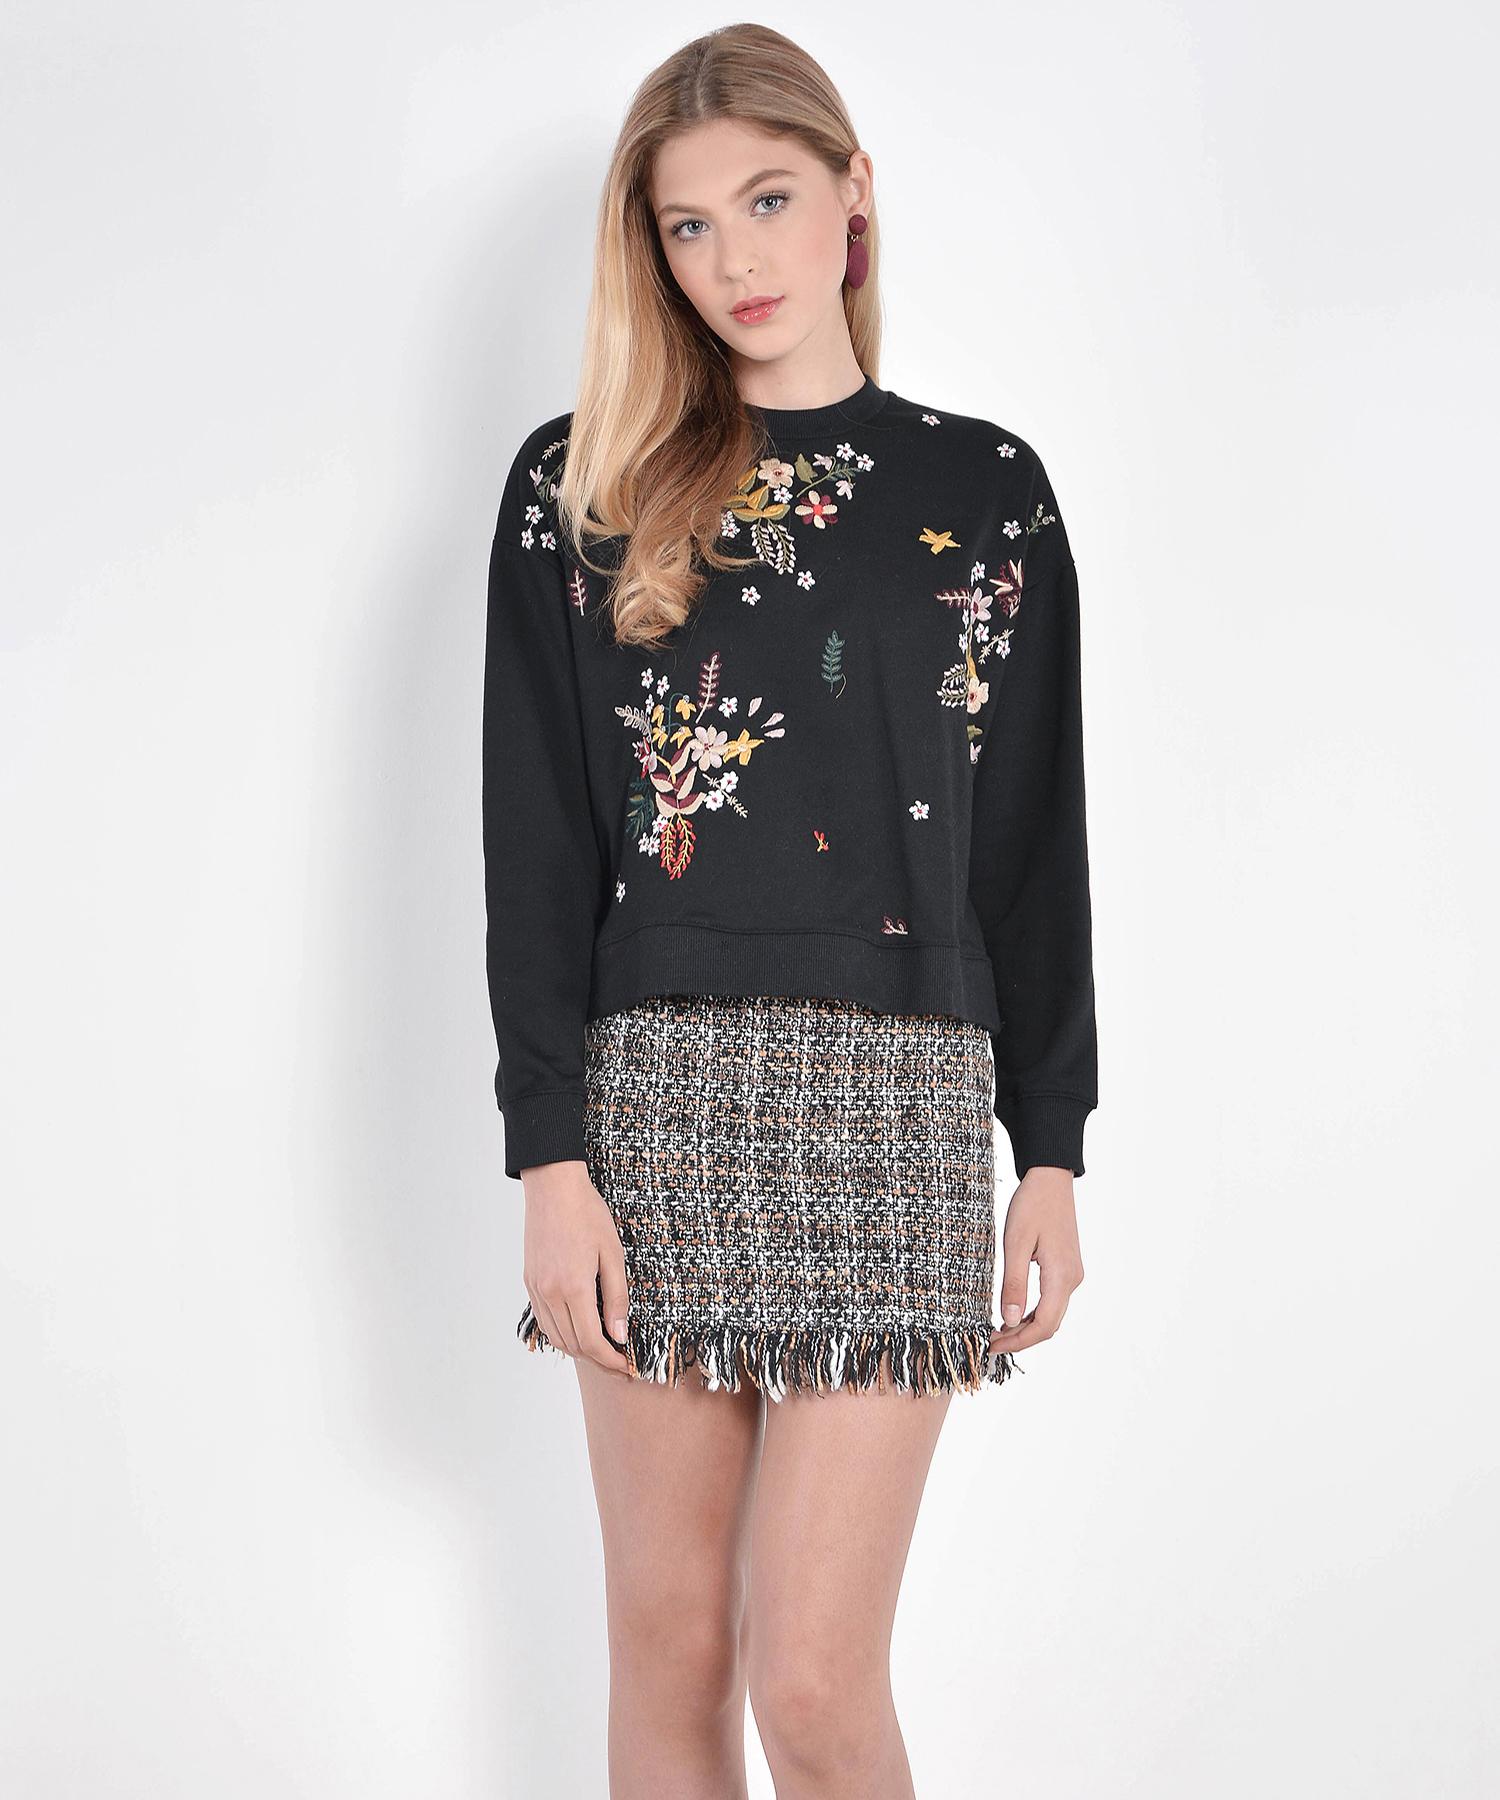 Classic and Stylish Ways to wear Skorts - Ohh My My | 1800x1500